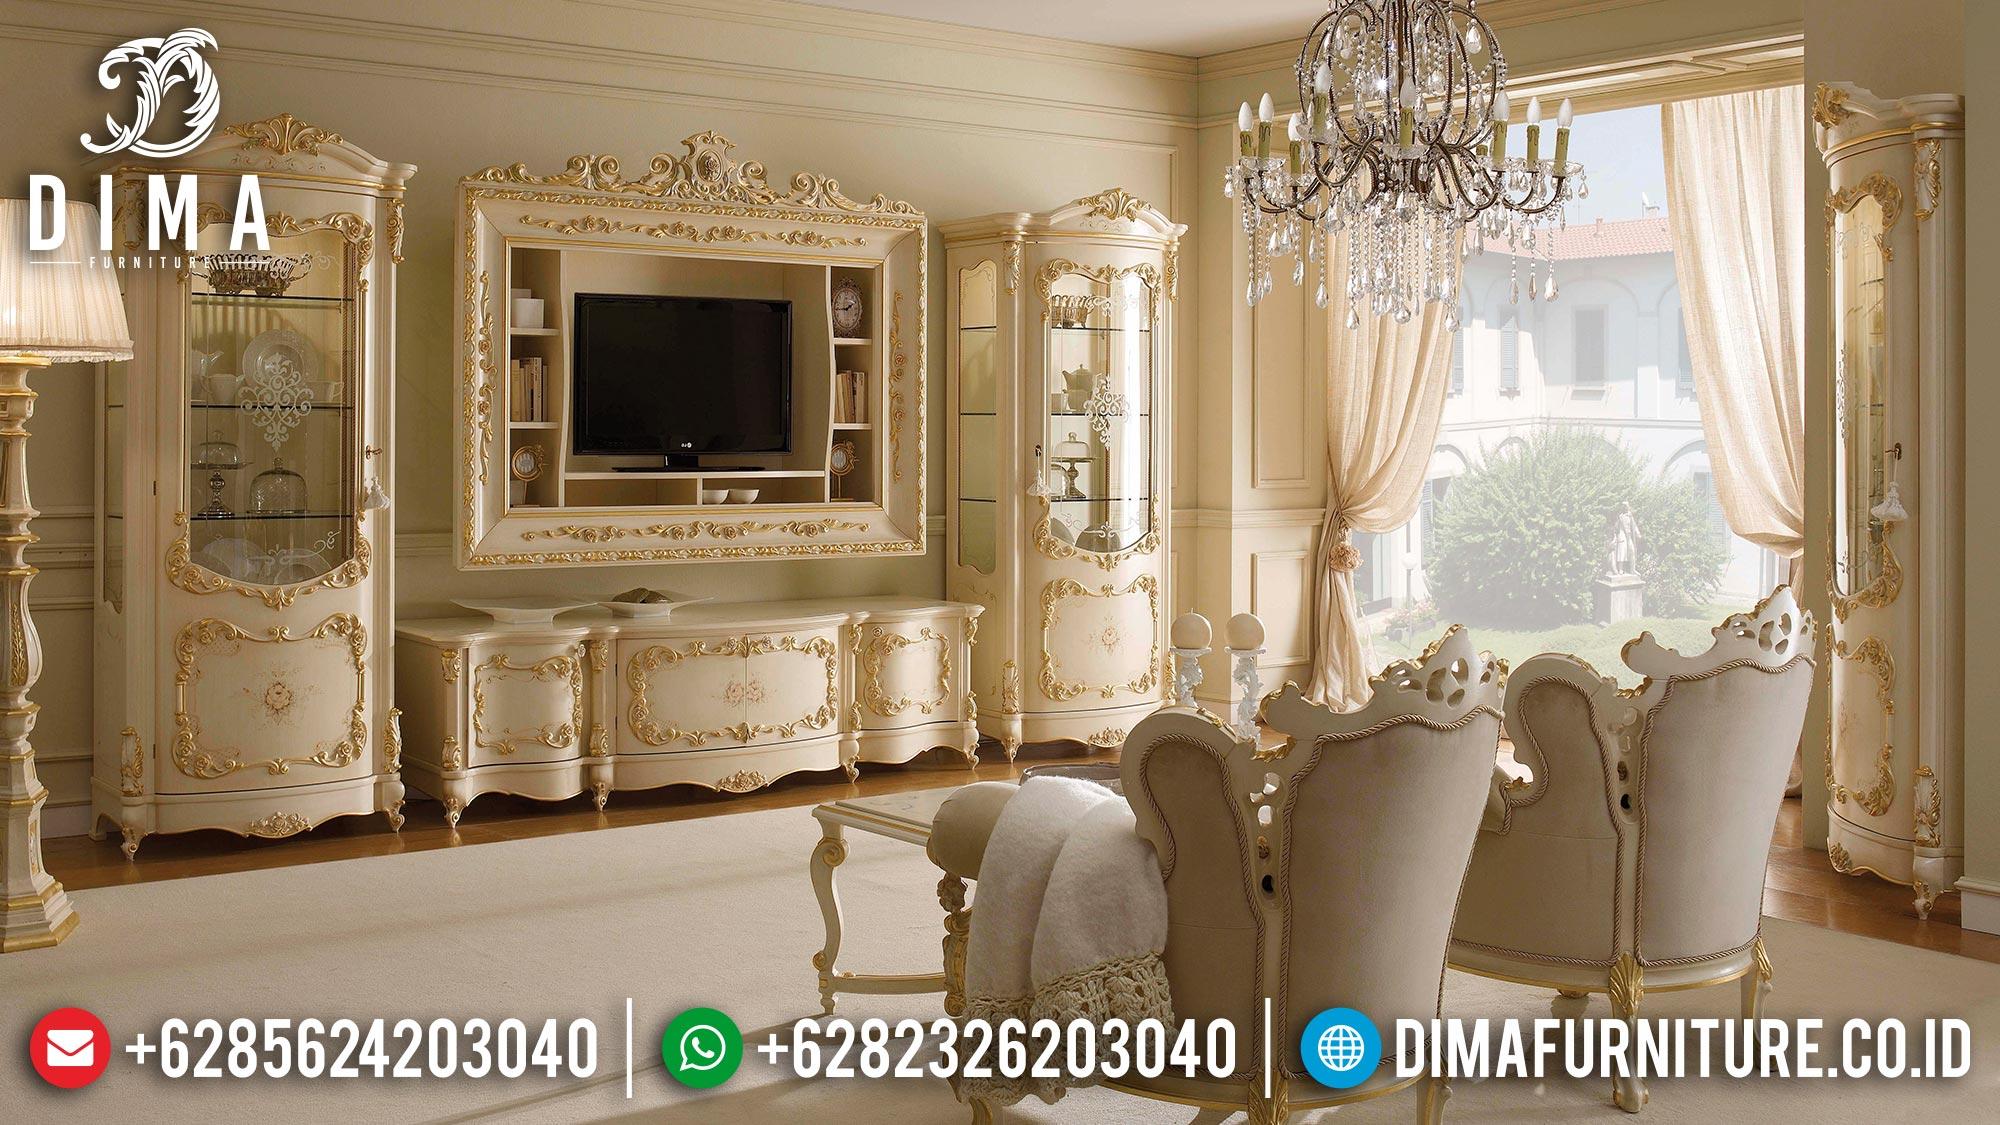 Great Desain Meja TV Mewah Set Bufet TV Ukir Luxurious Classic BT-0986